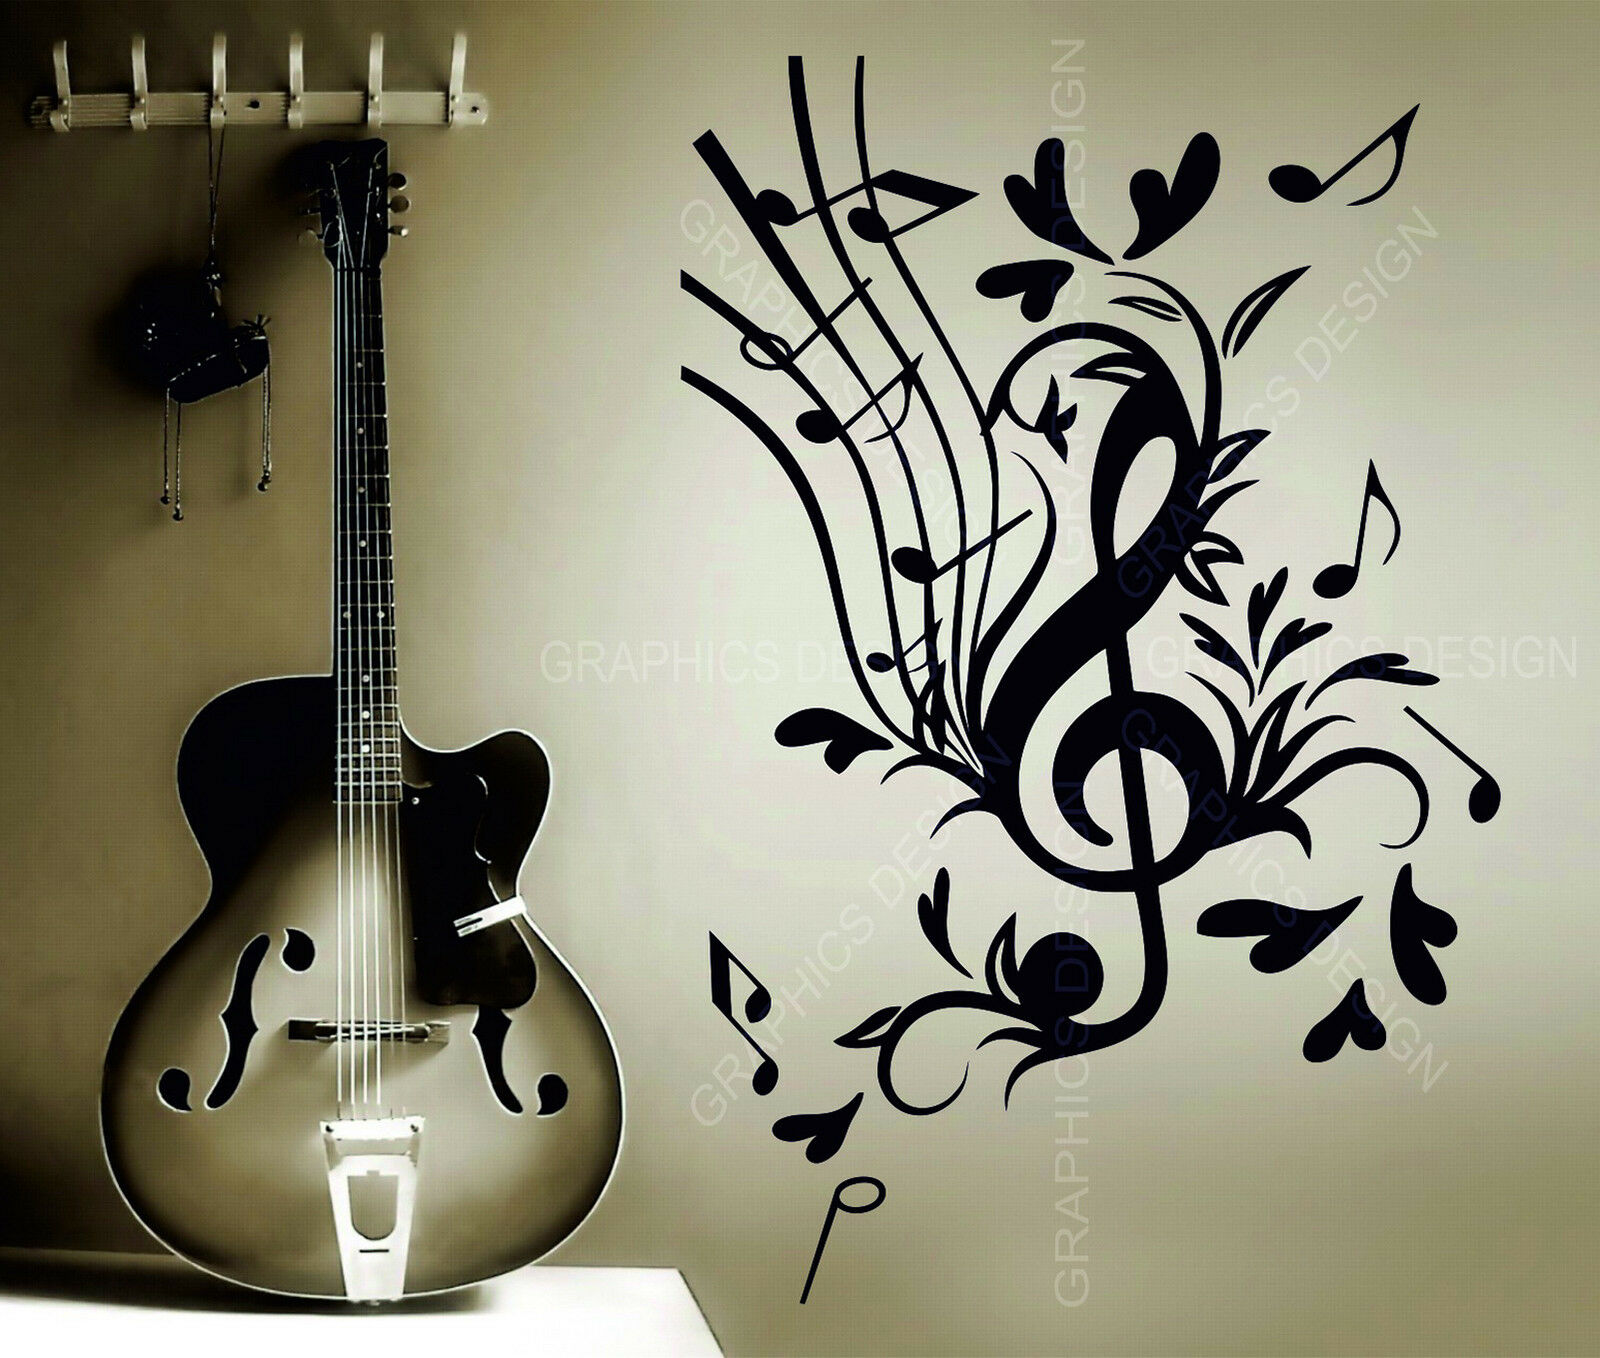 Treble Clef Sol Key Floral Music Notes Treble Decor Vinyl Wall Sticker Decal Art Ebay